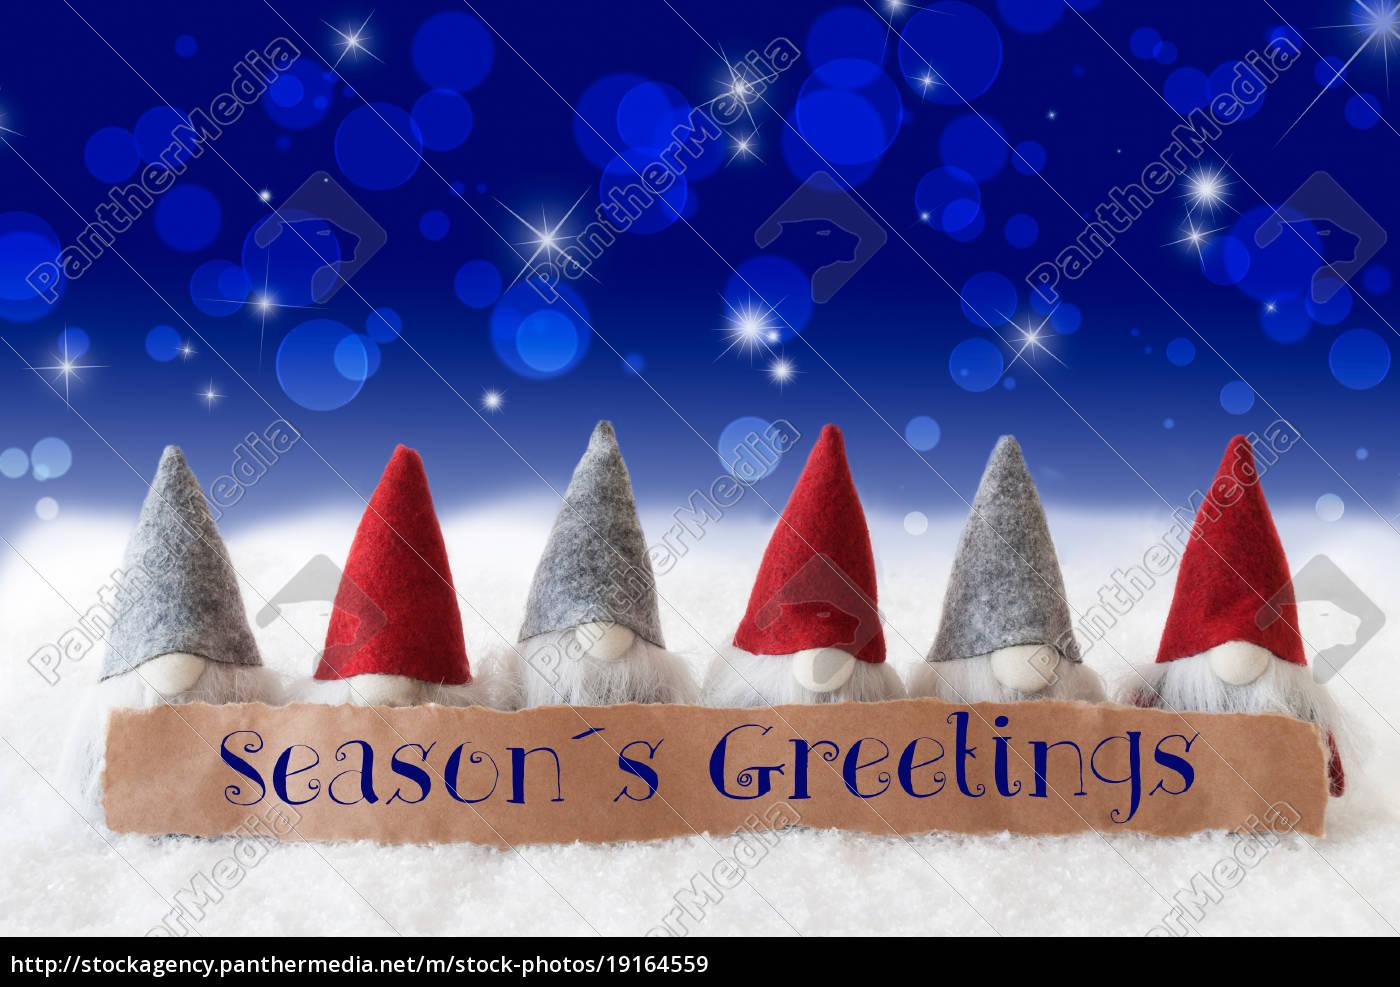 gnomes, , blue, background, , bokeh, , stars, , text - 19164559